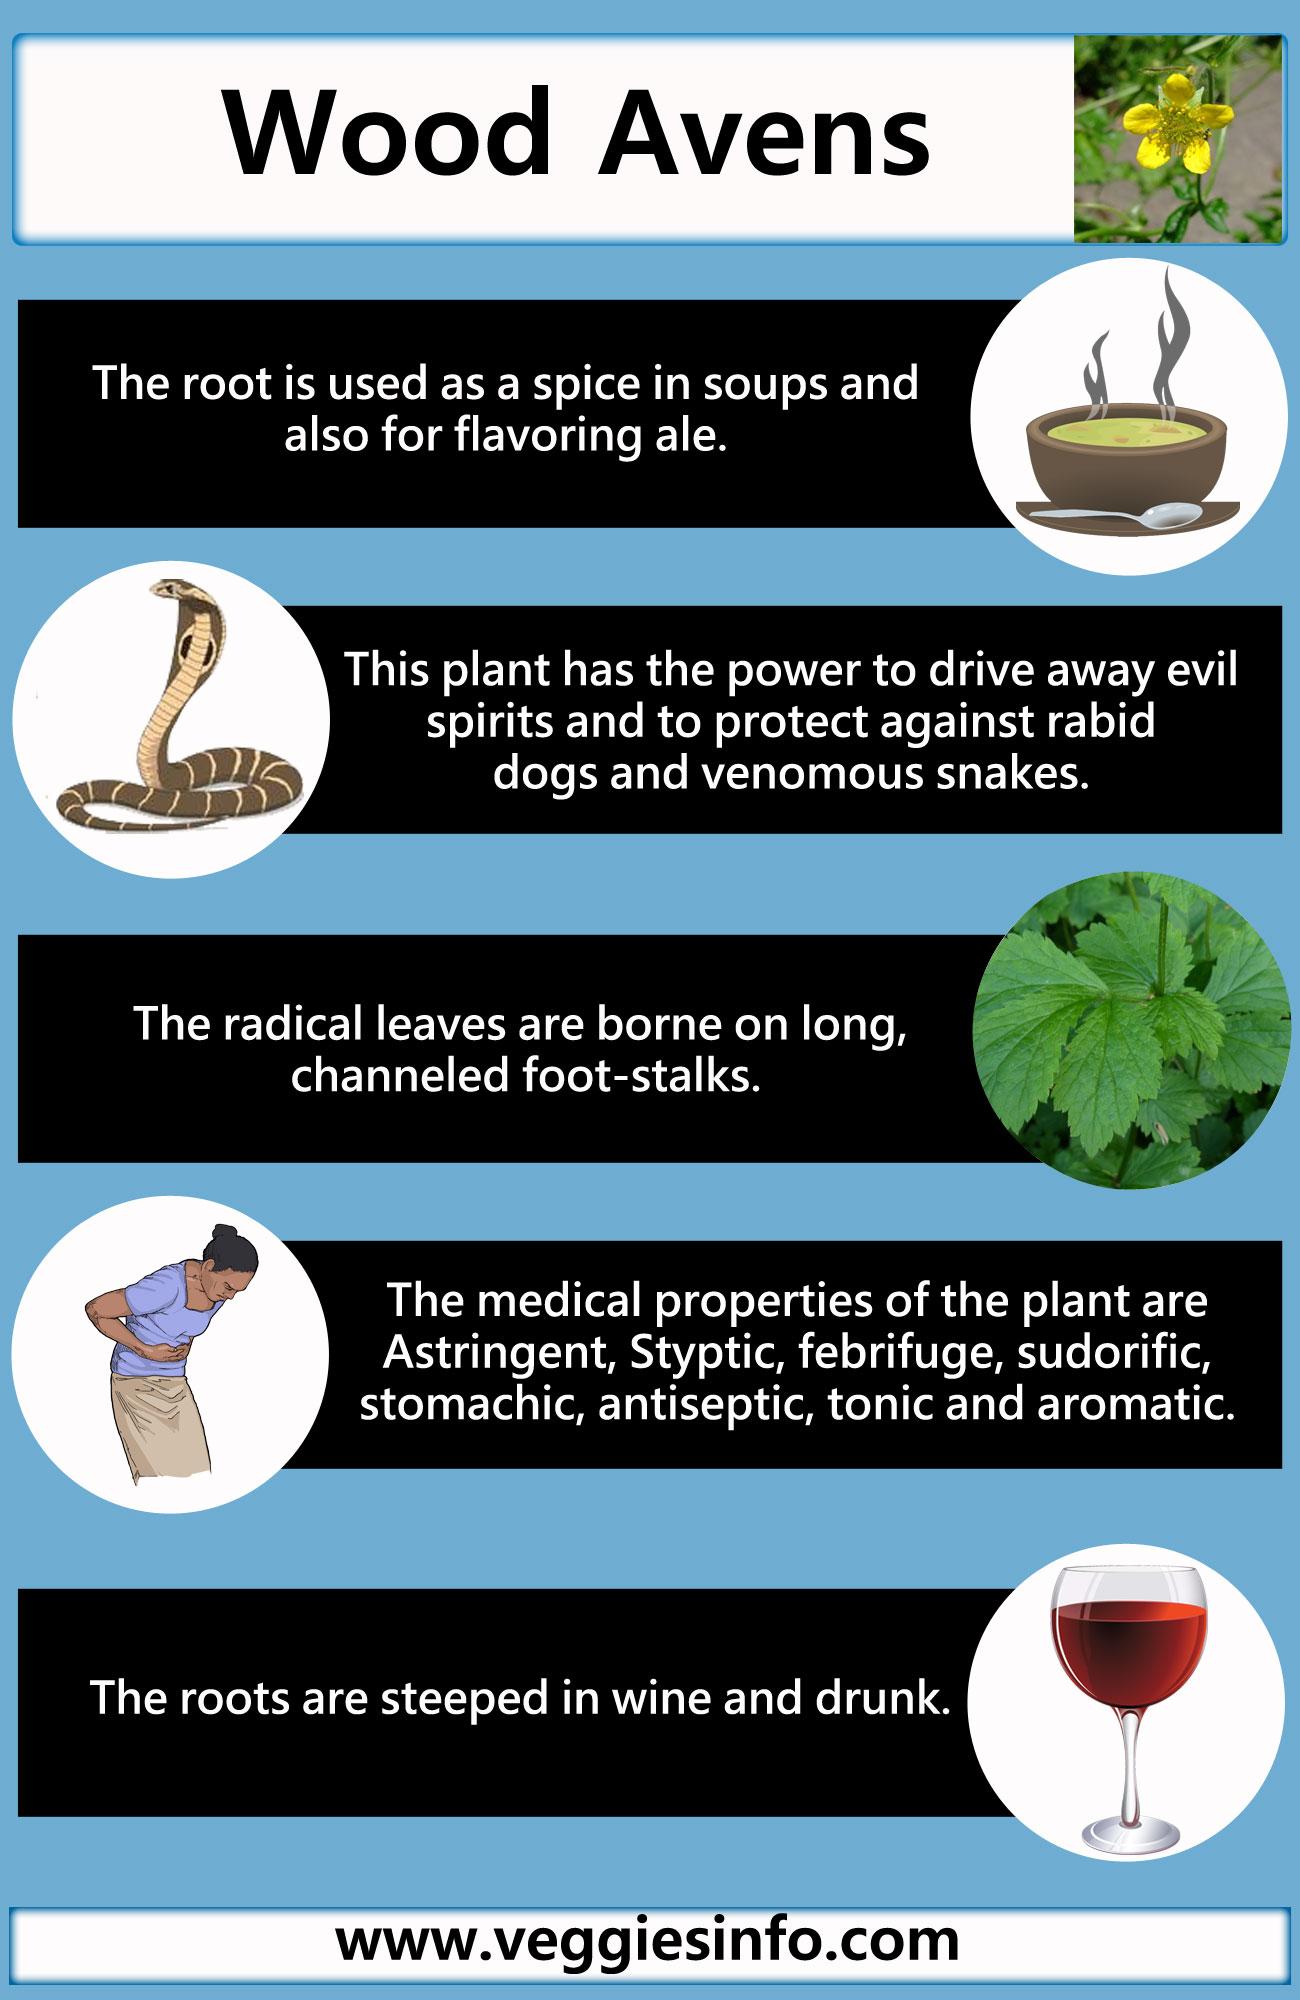 Health Benefits of Wood Avens